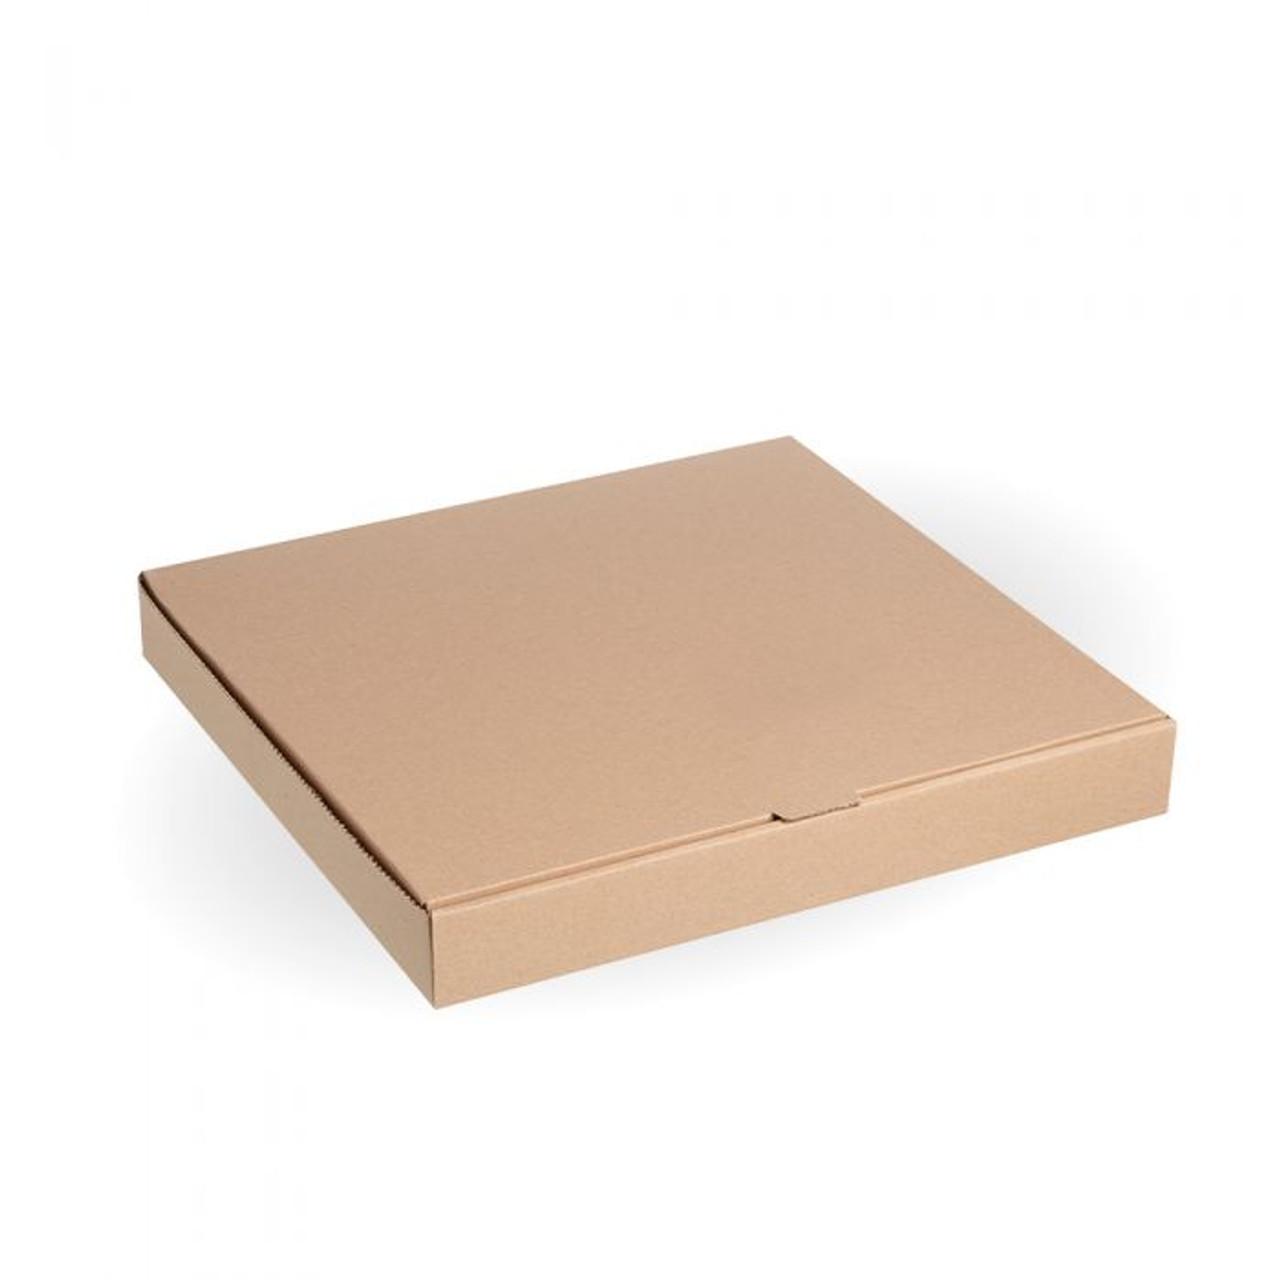 "14"" KRAFT PIZZA BOXES x 50"